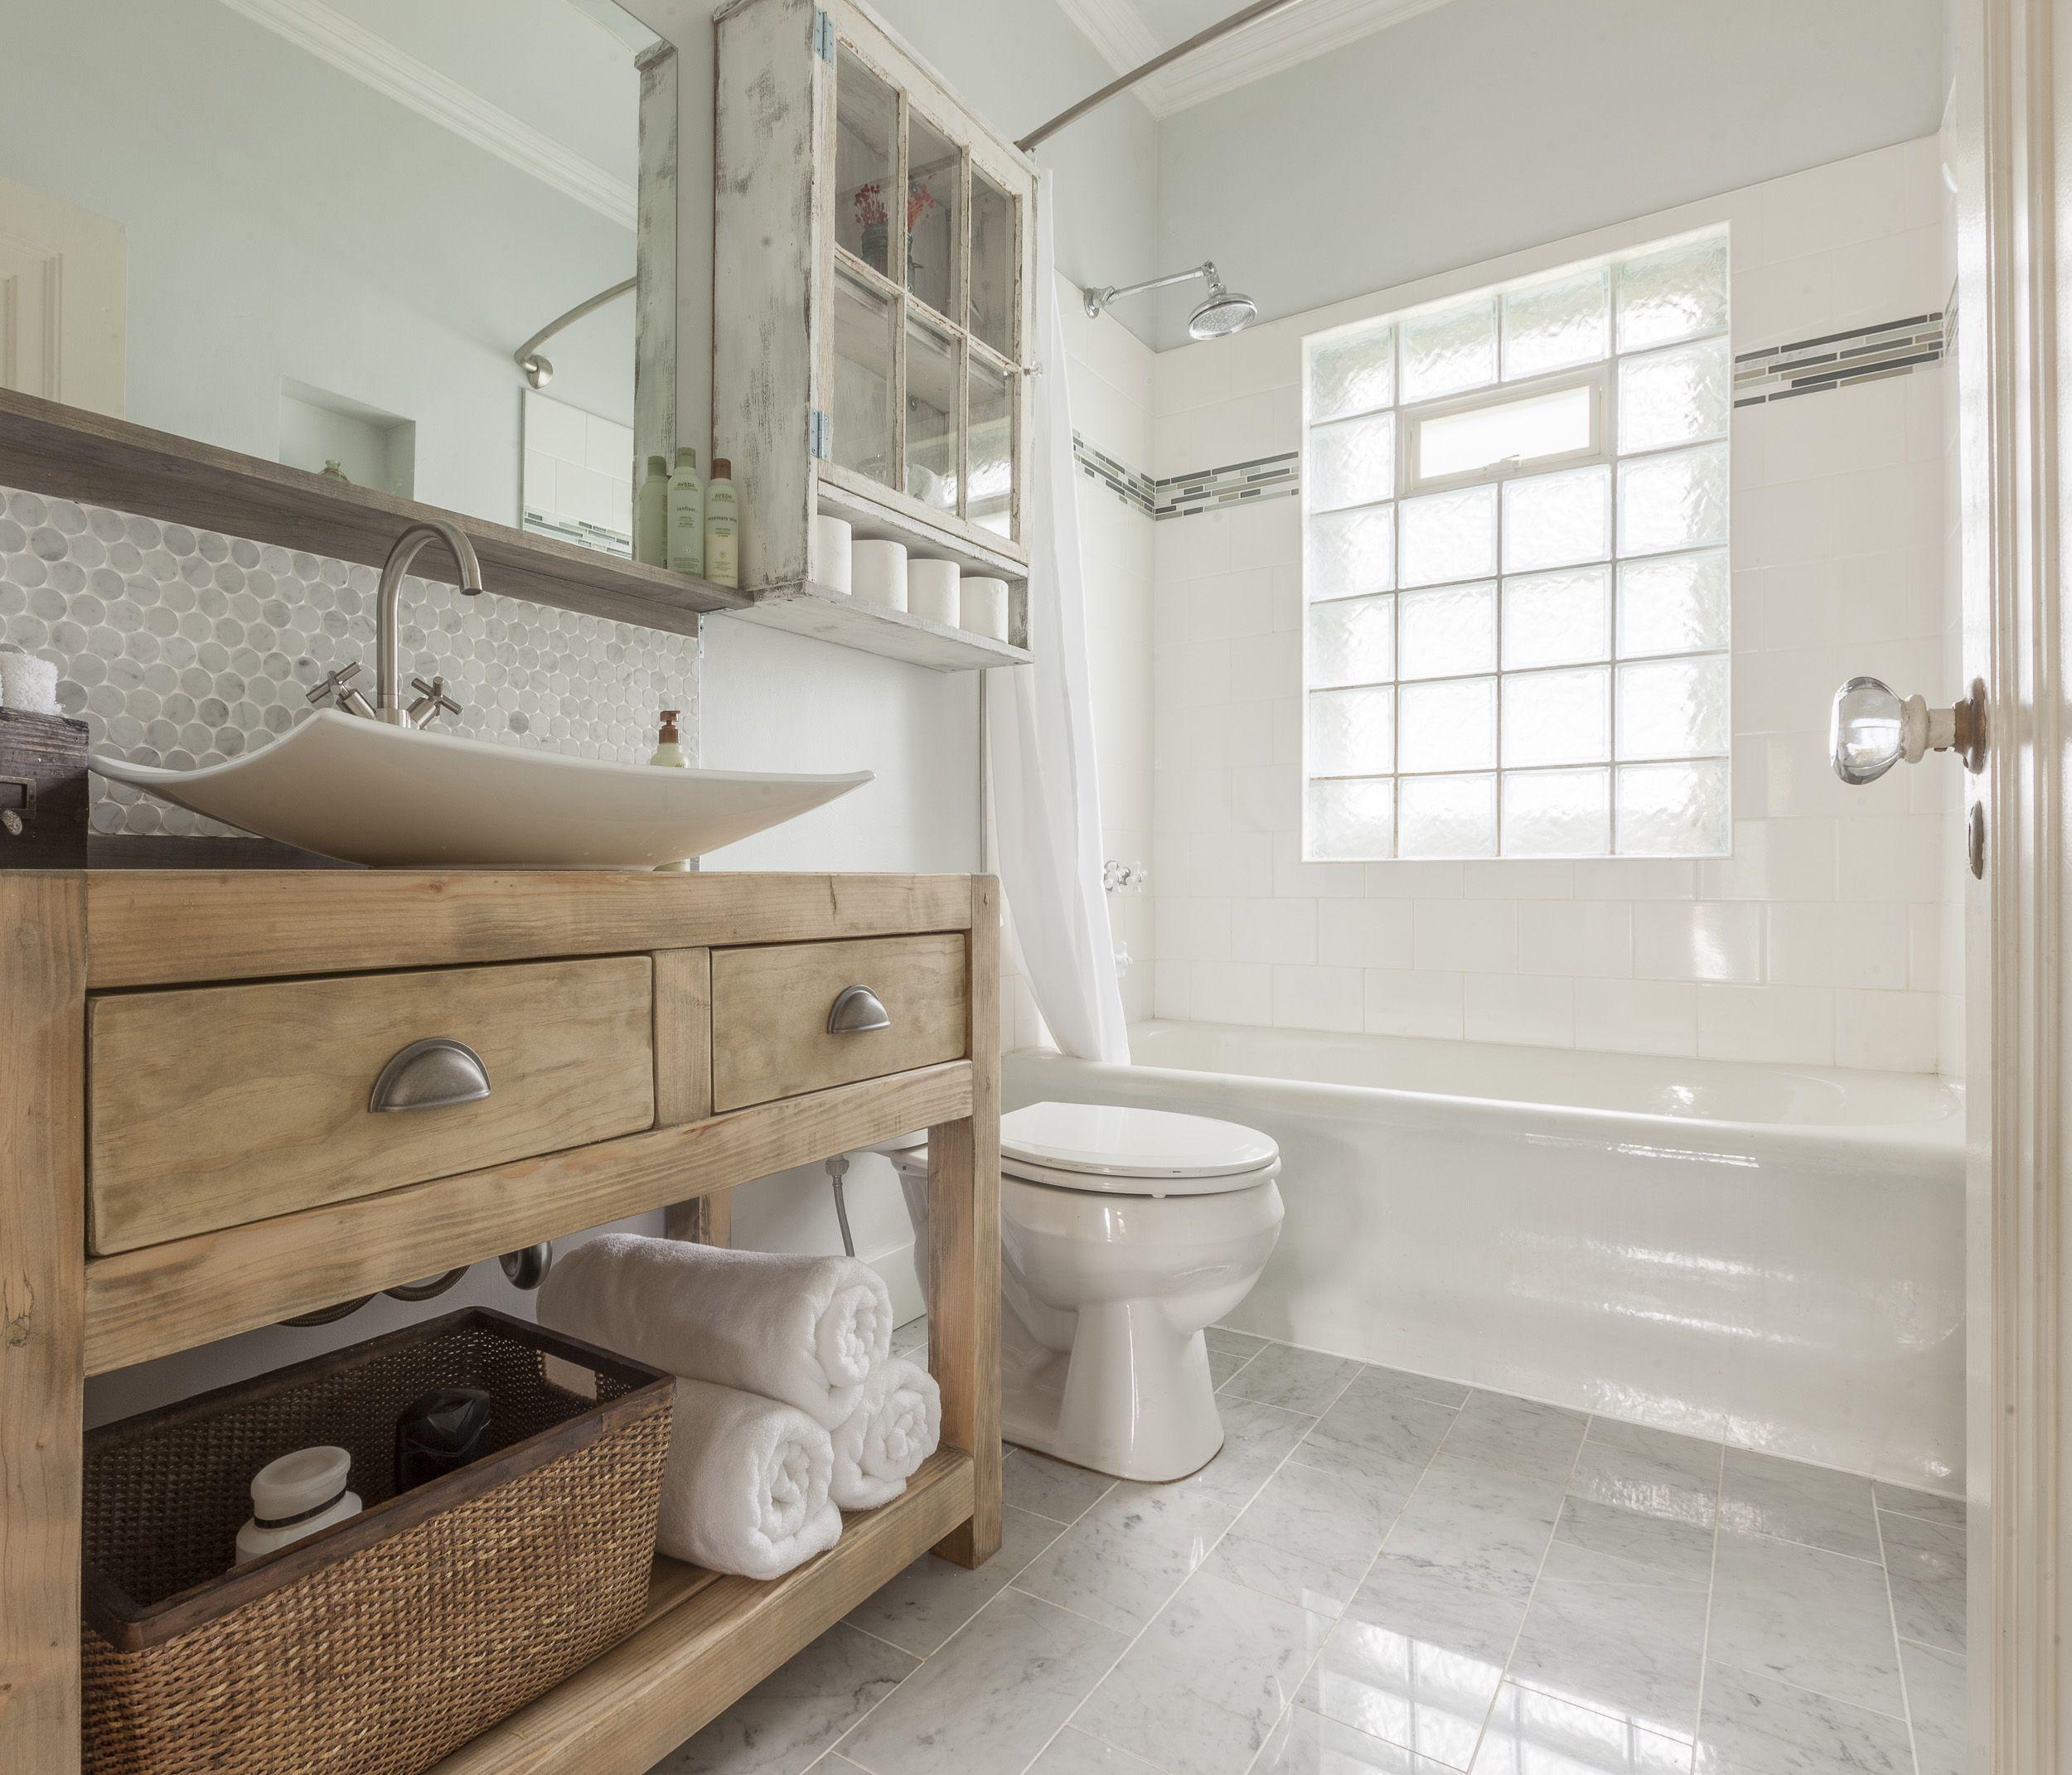 Rustic Modern Bathroom Carrera Marble Floor Jonathan Thrasher